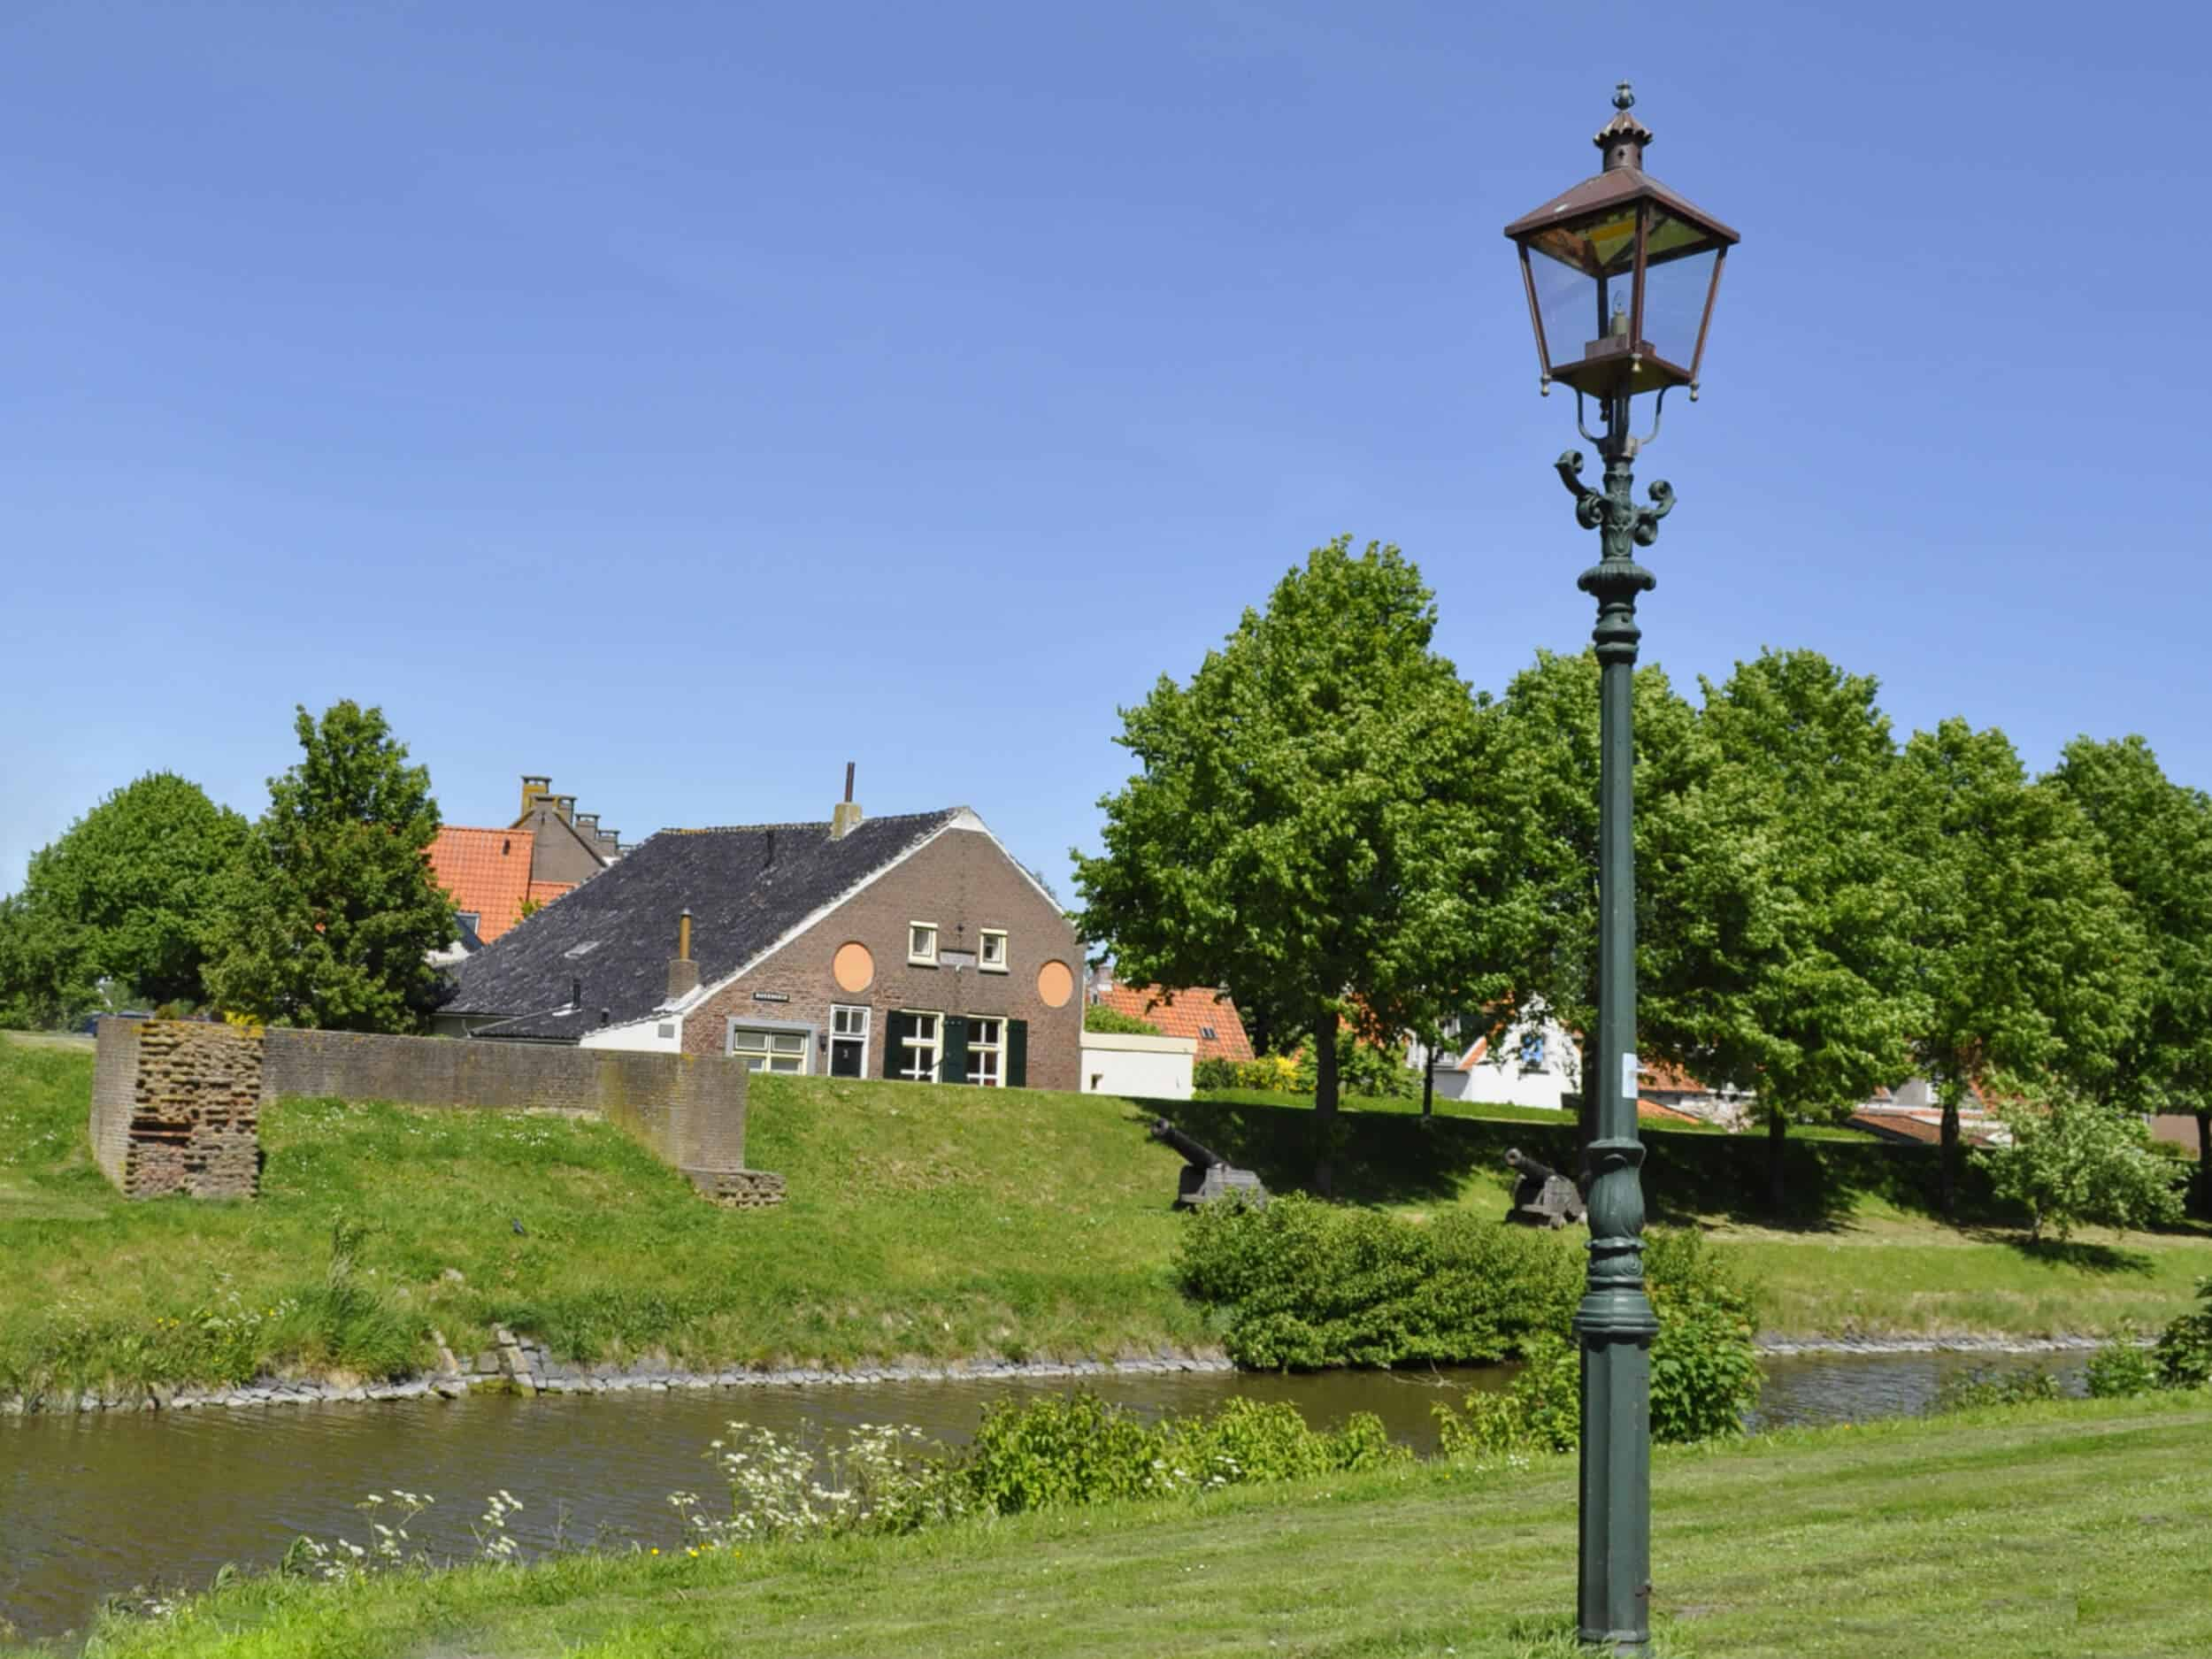 DE NOOD klassiek armatuur Hollandse Kap